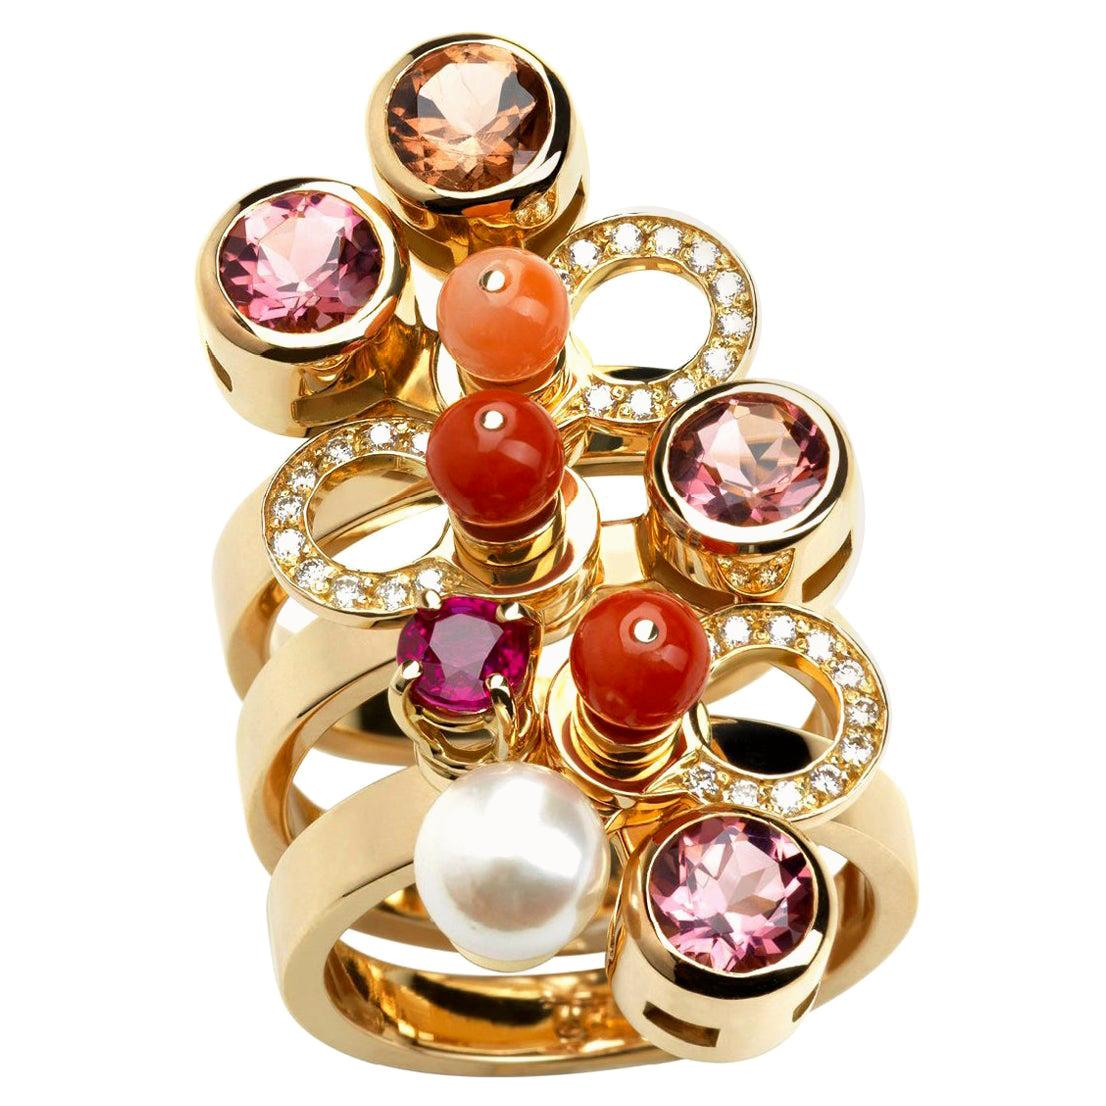 Nathalie Jean 0.165 Carat Diamond Ruby Tourmaline Pearl Carnelian Gold Rings